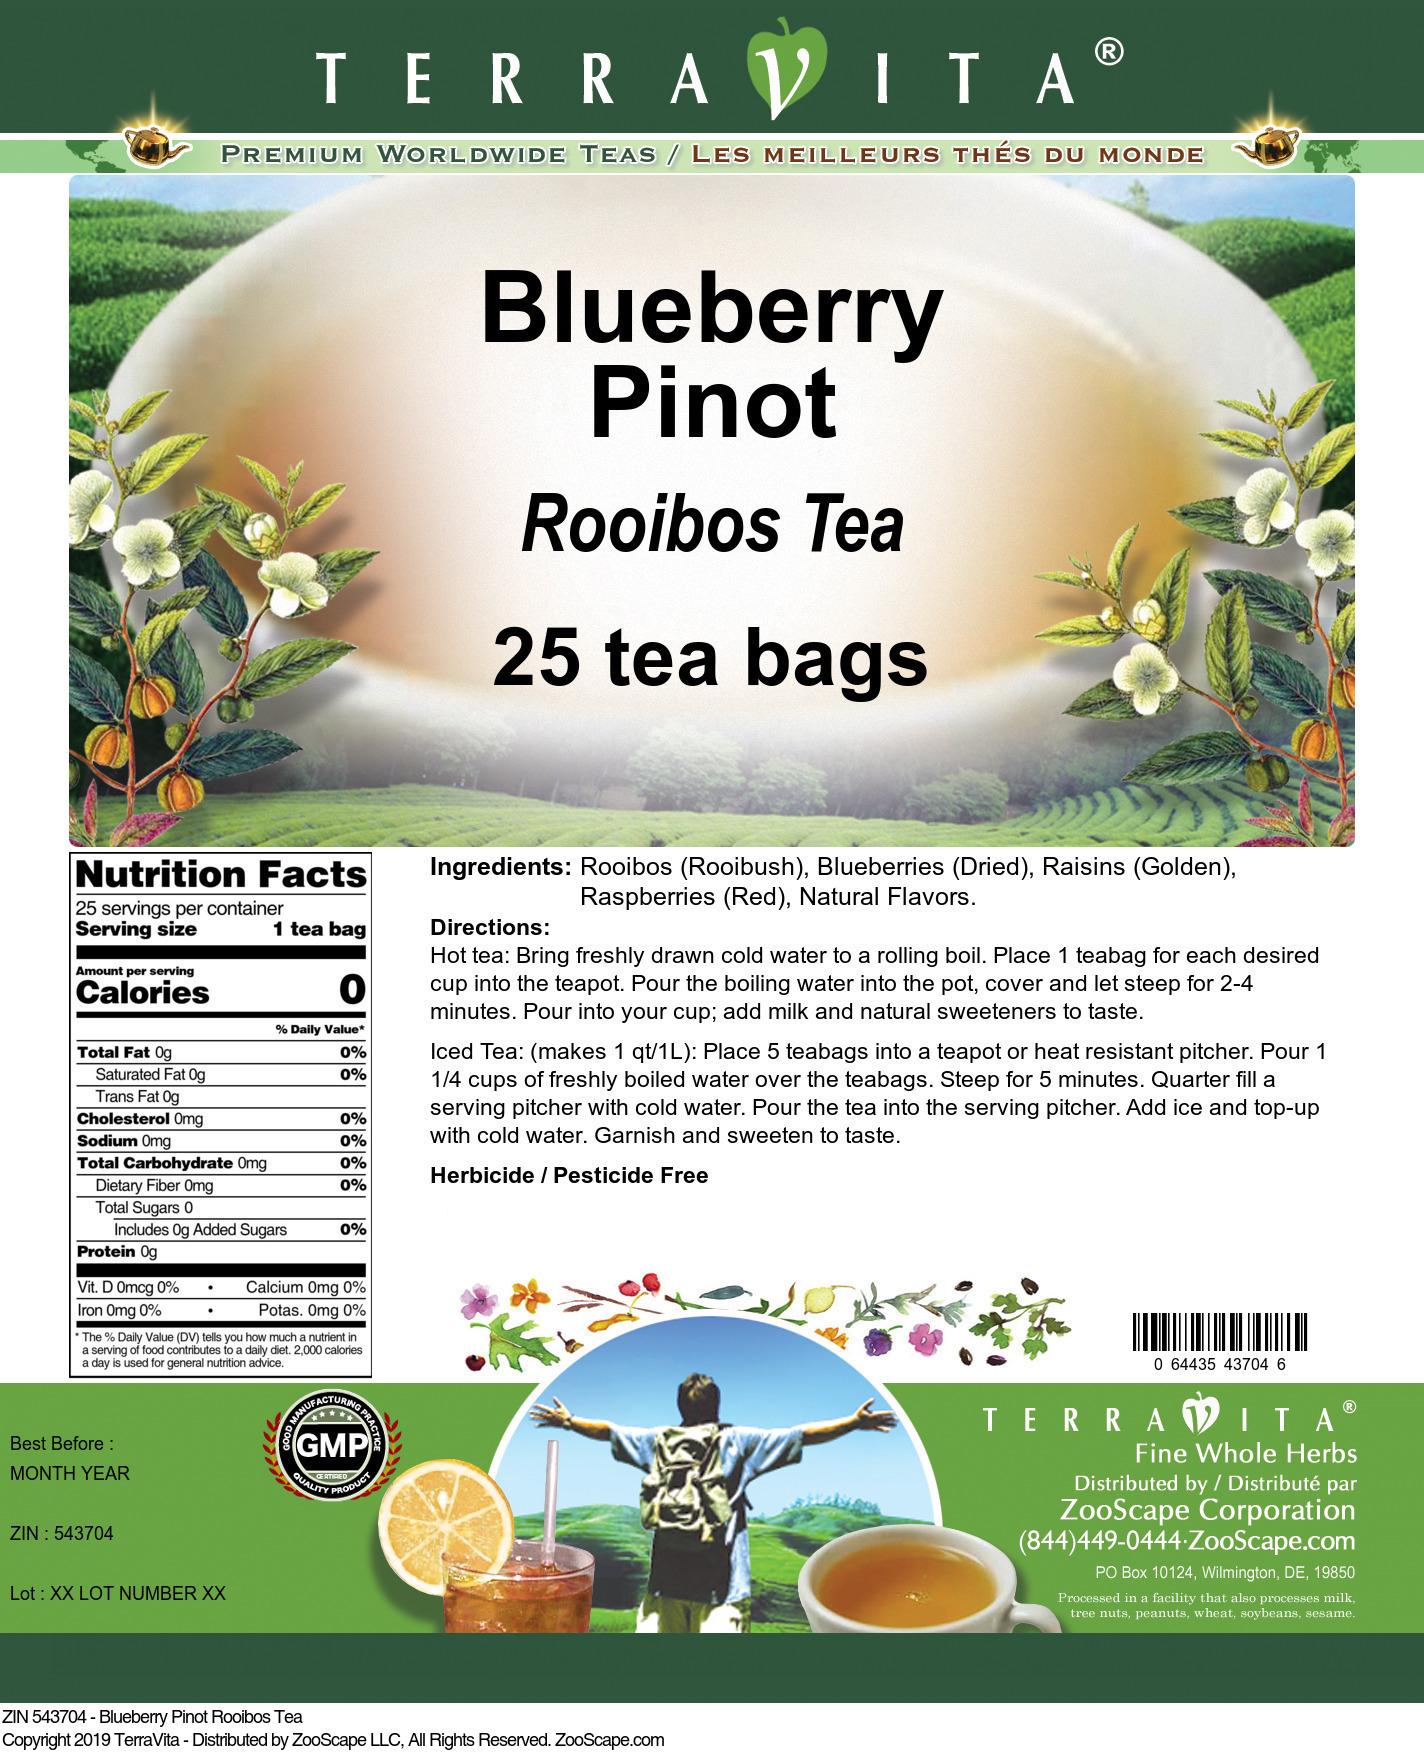 Blueberry Pinot Rooibos Tea